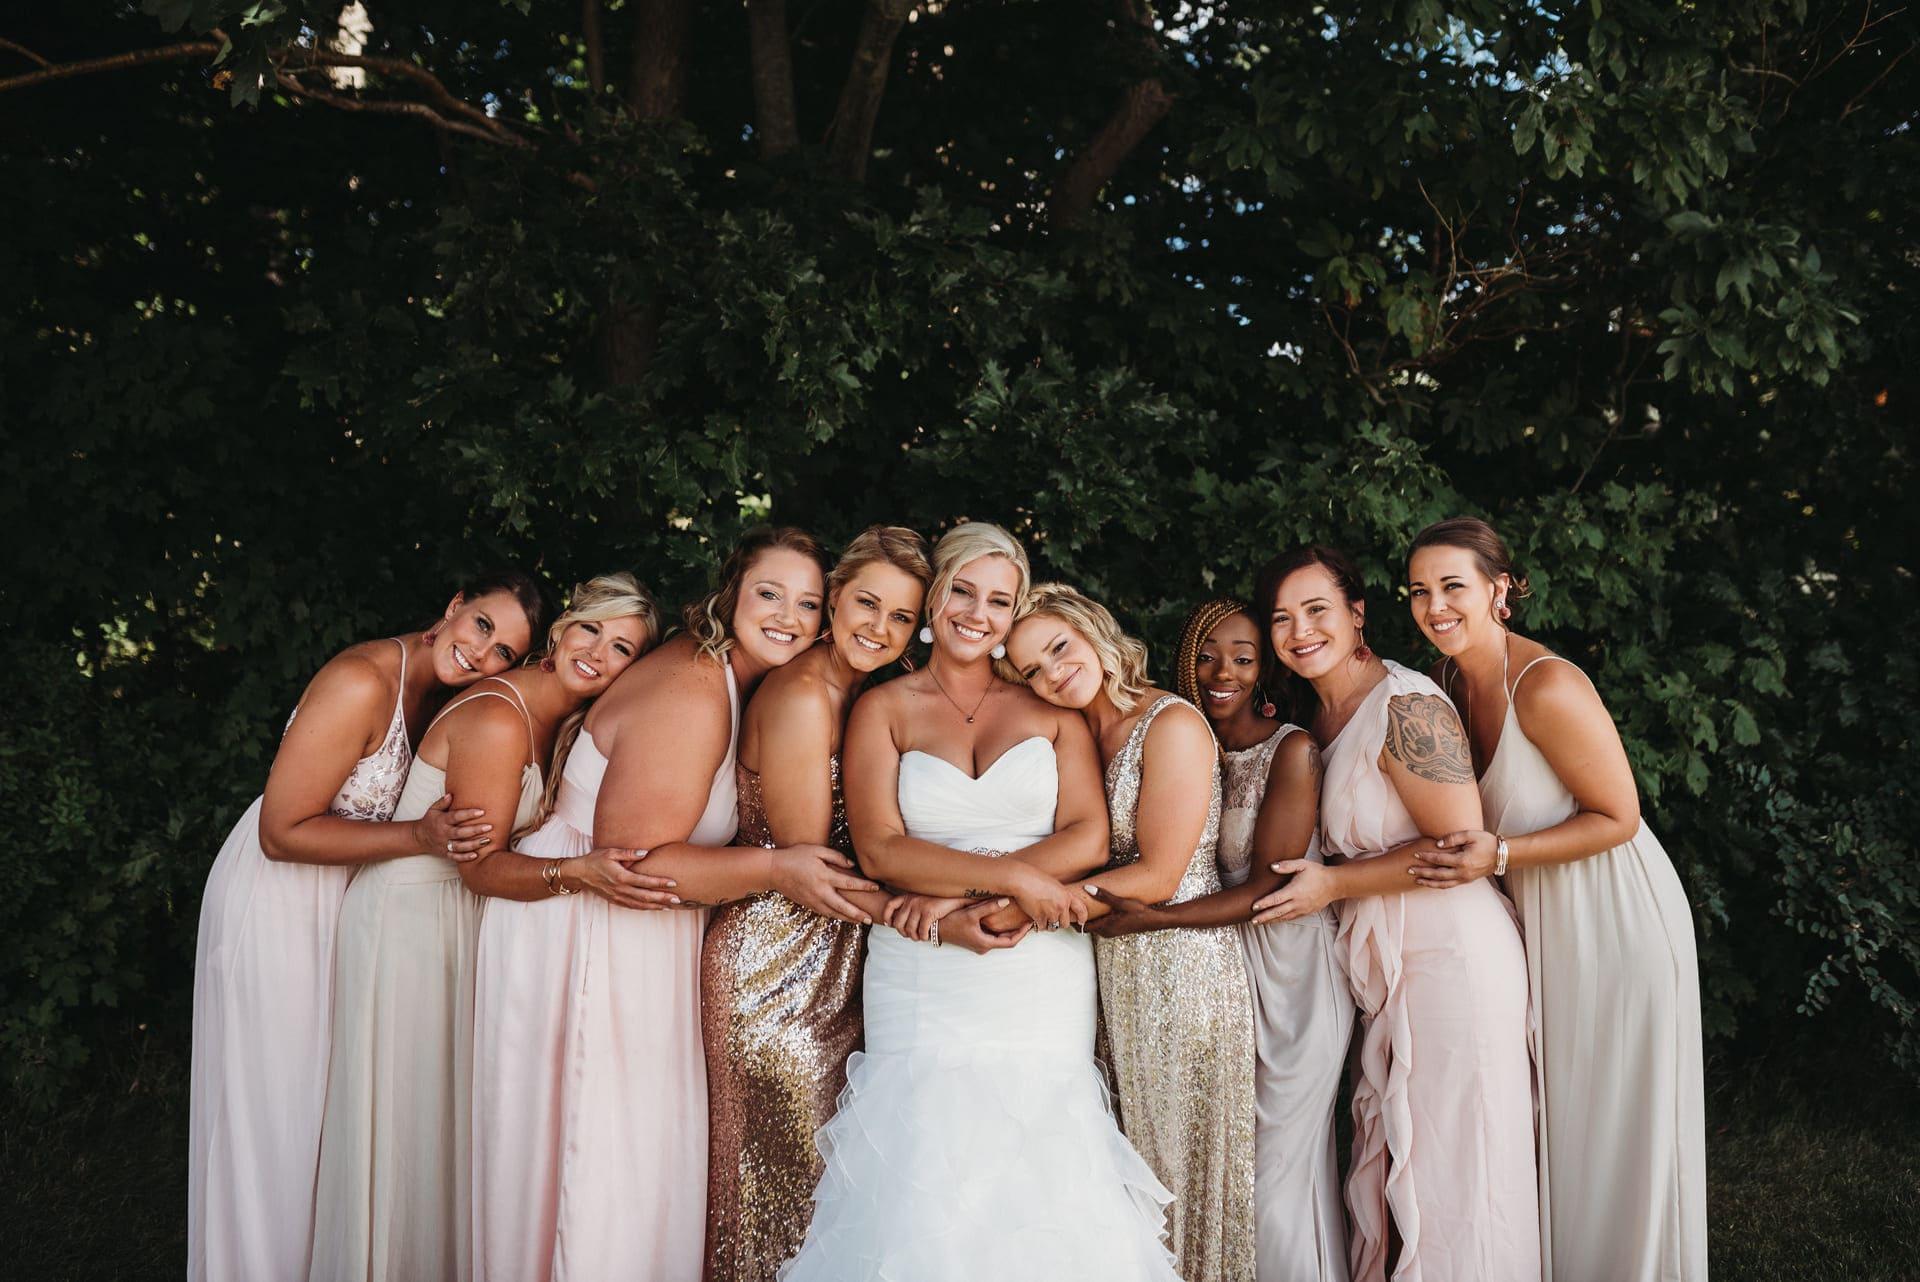 Bridesmaids Richland Michigan Wedding Photography